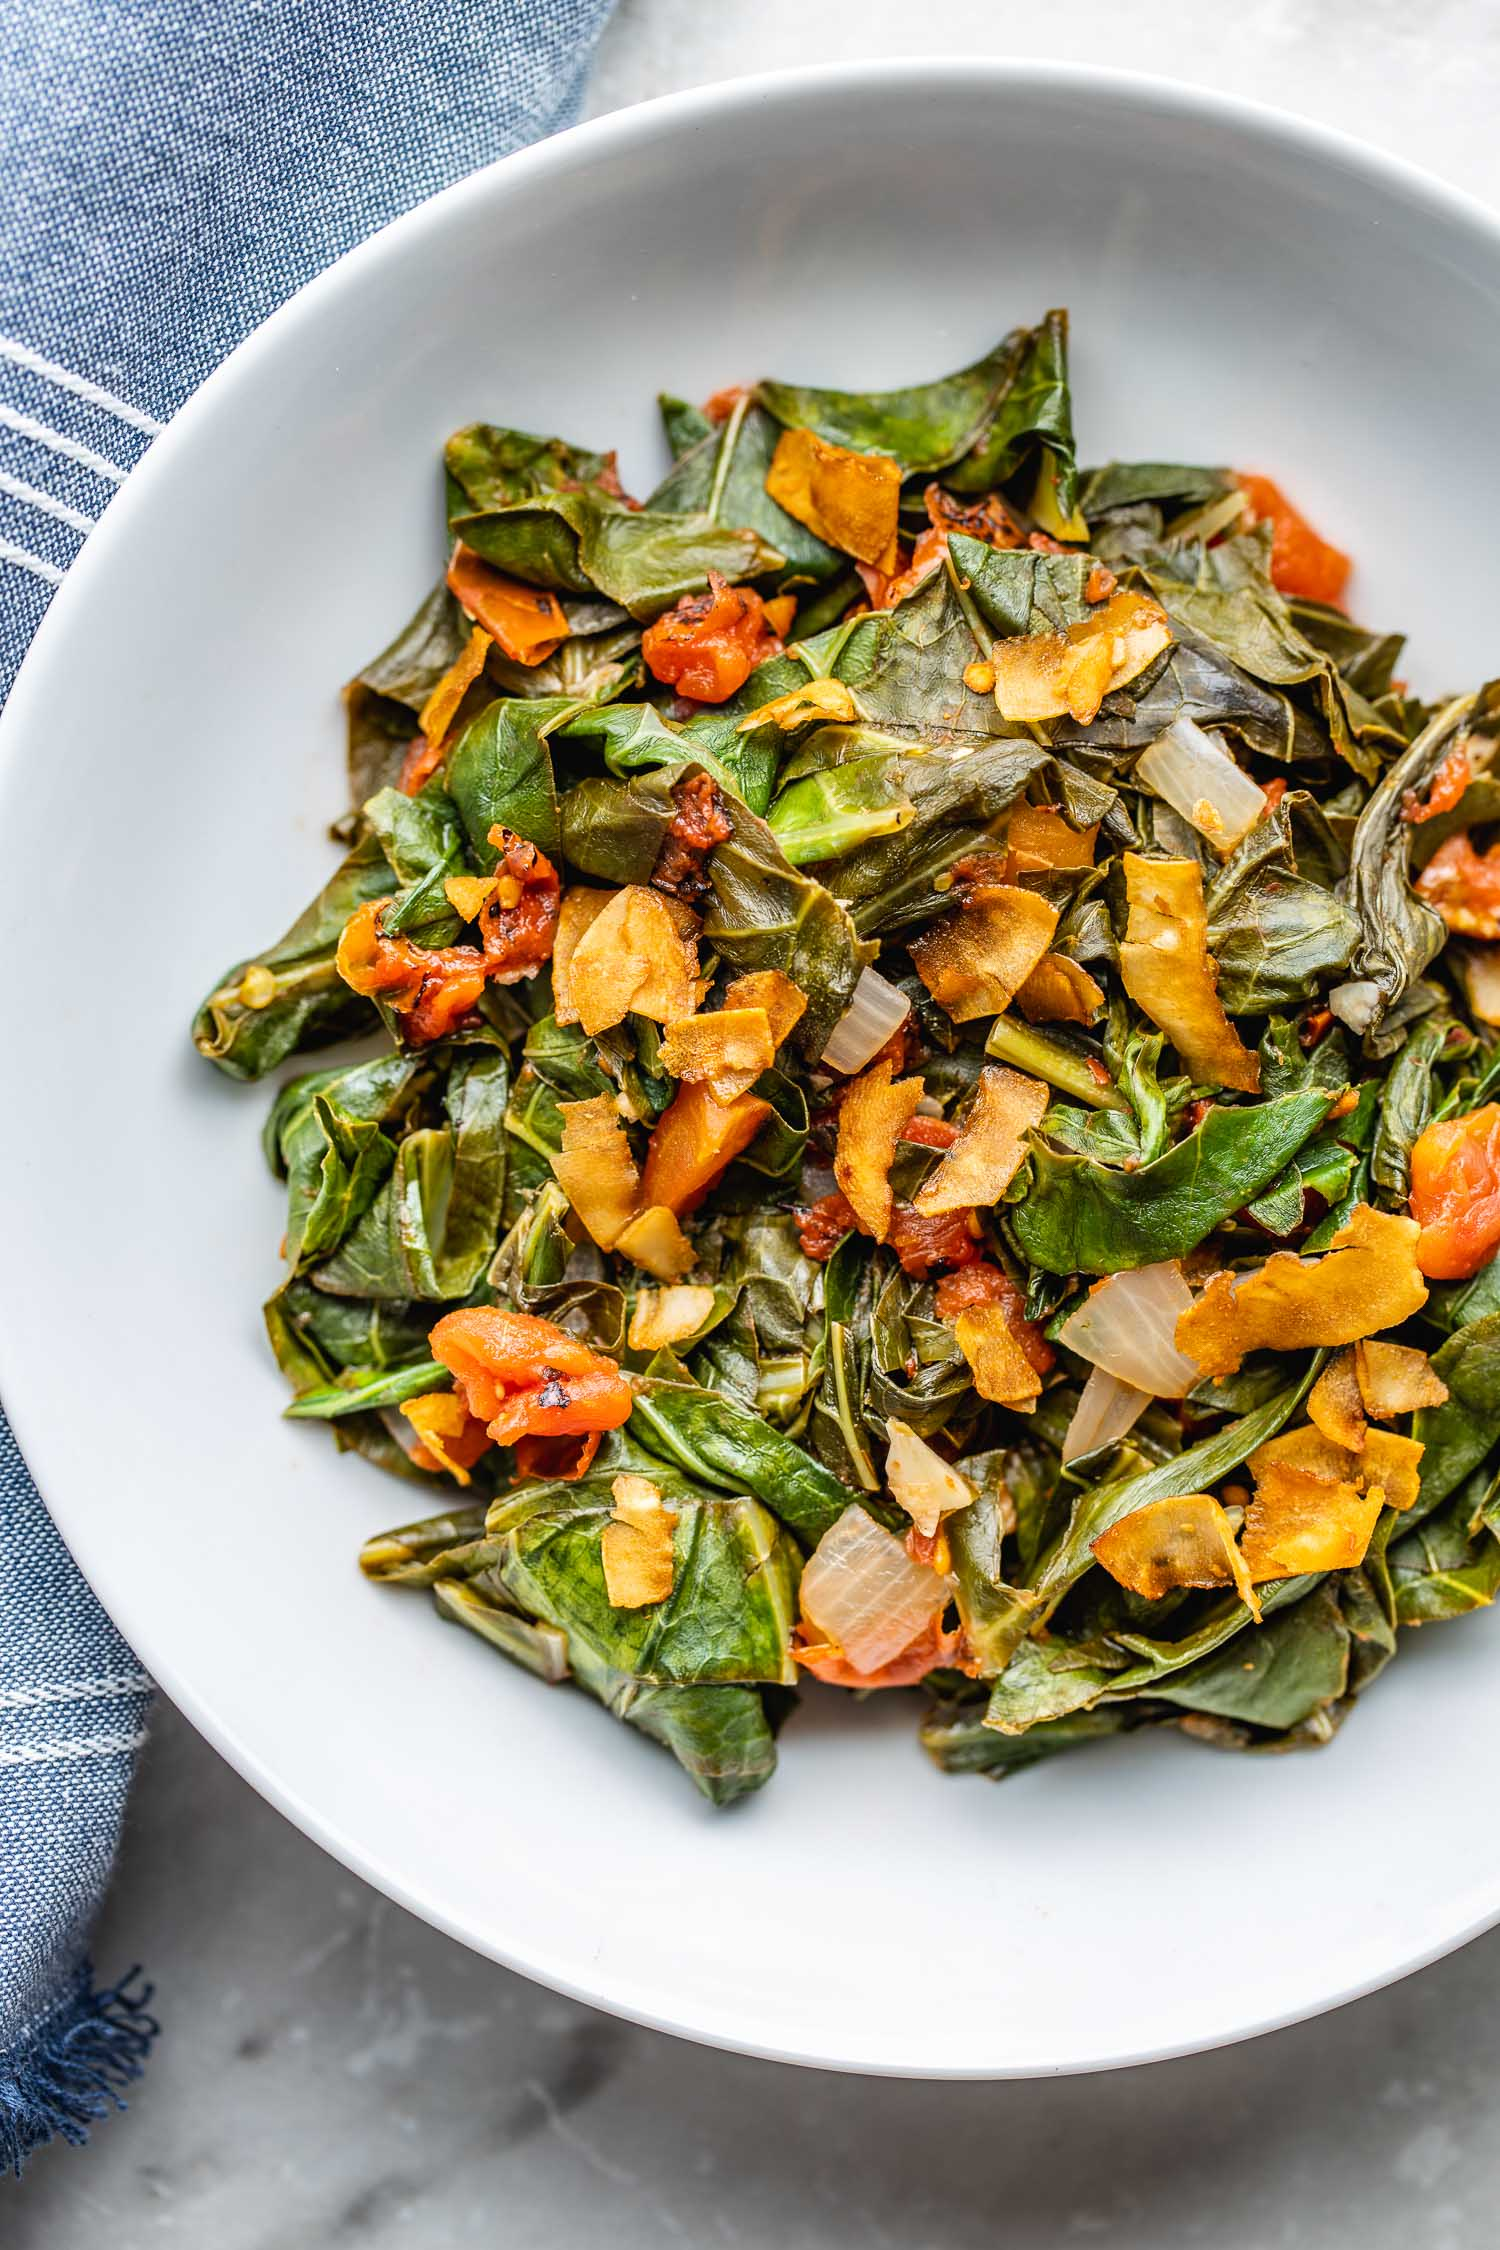 southern-style vegan collard greens in a white bowl